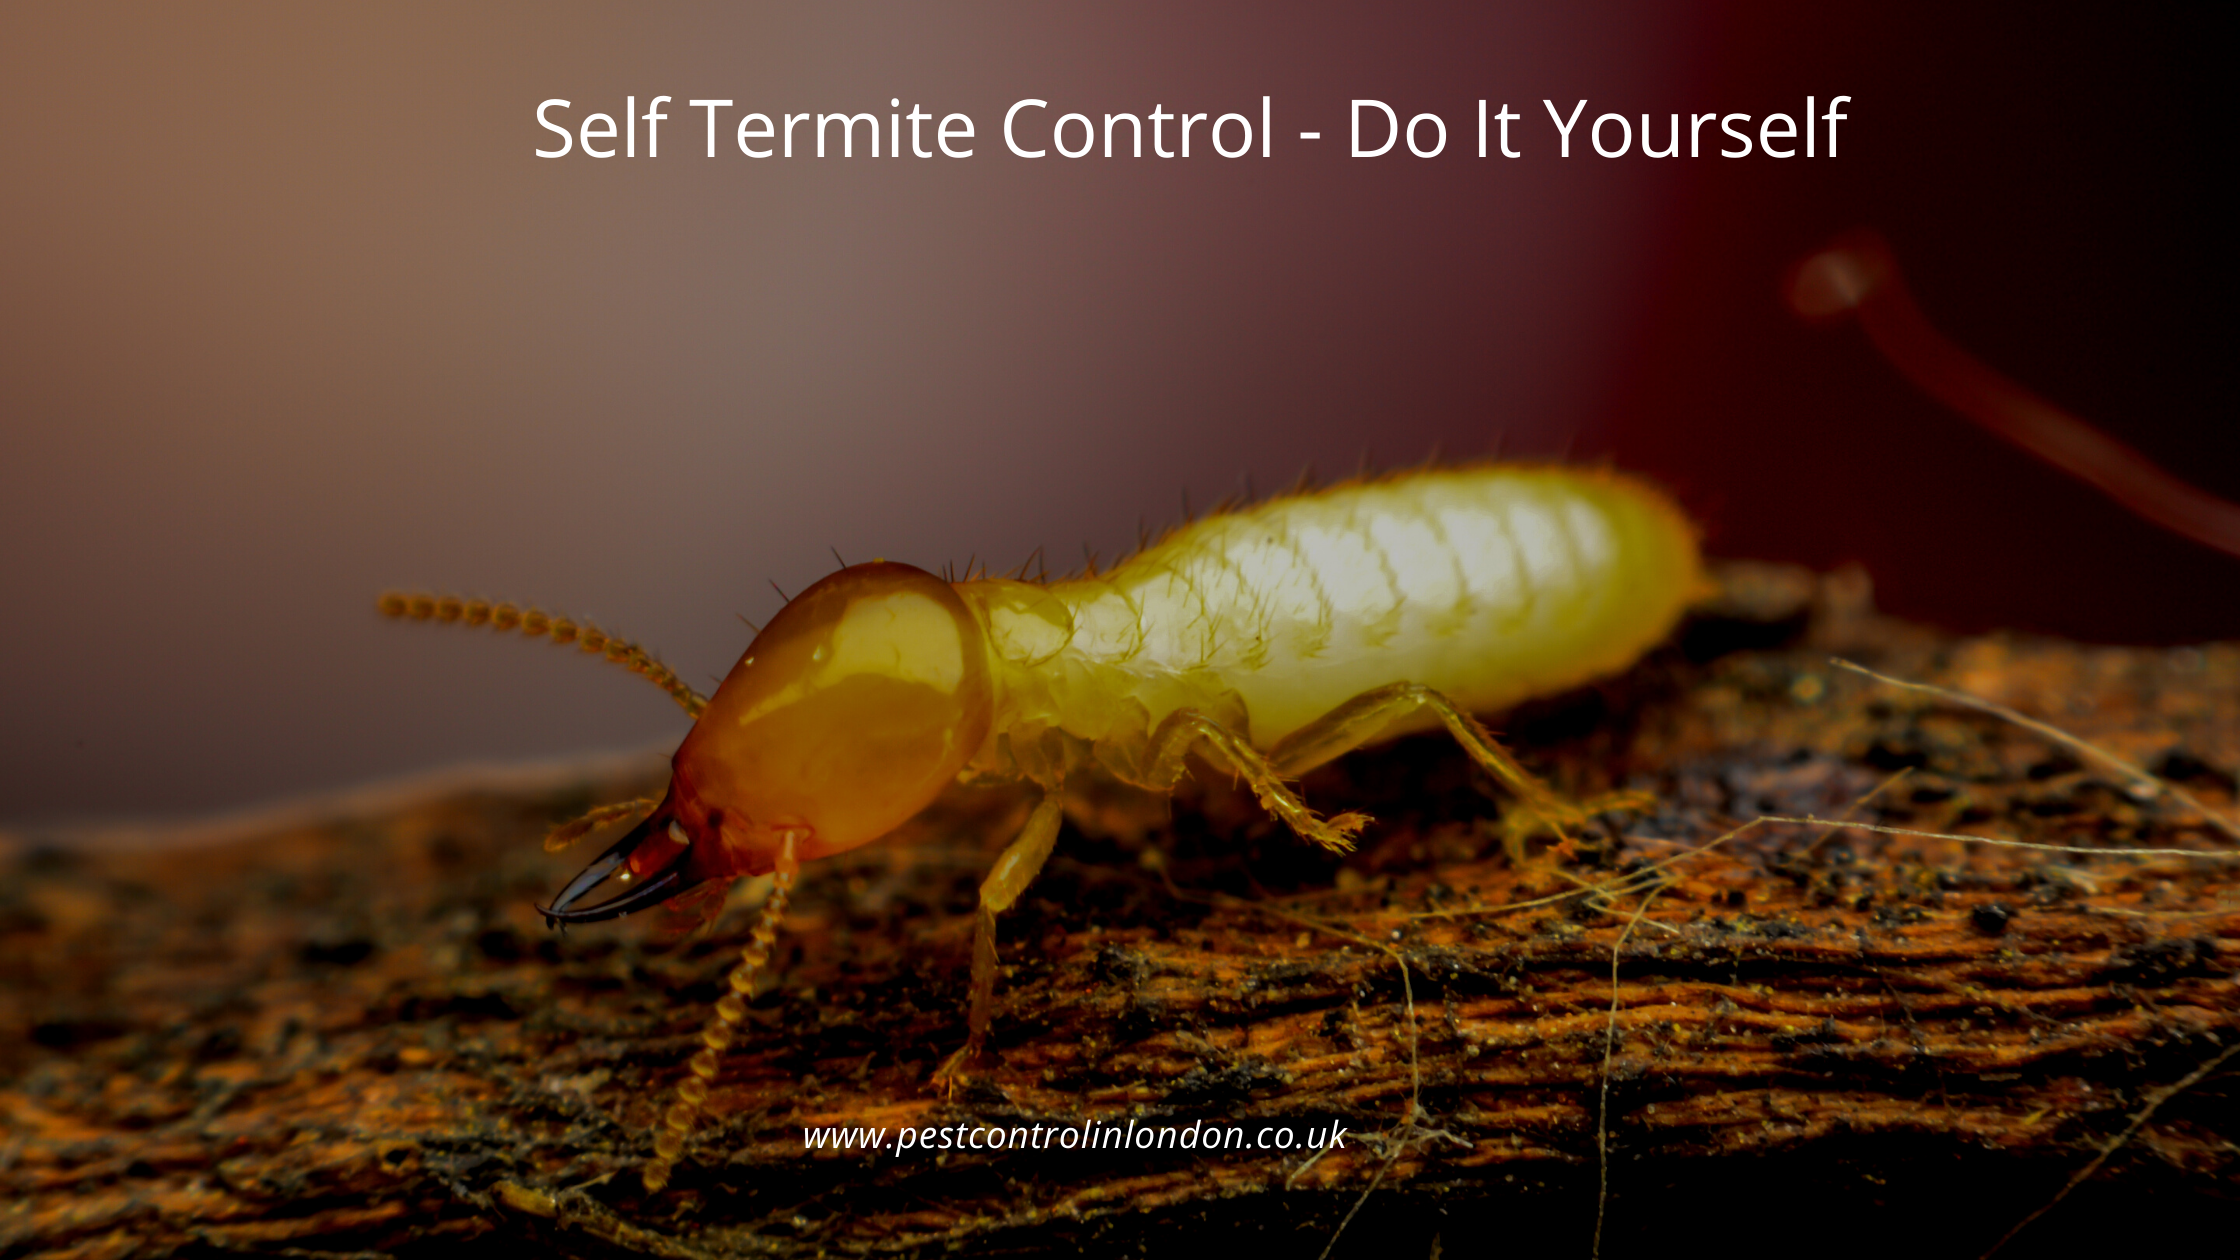 Self Termite Control- Do It Yourself